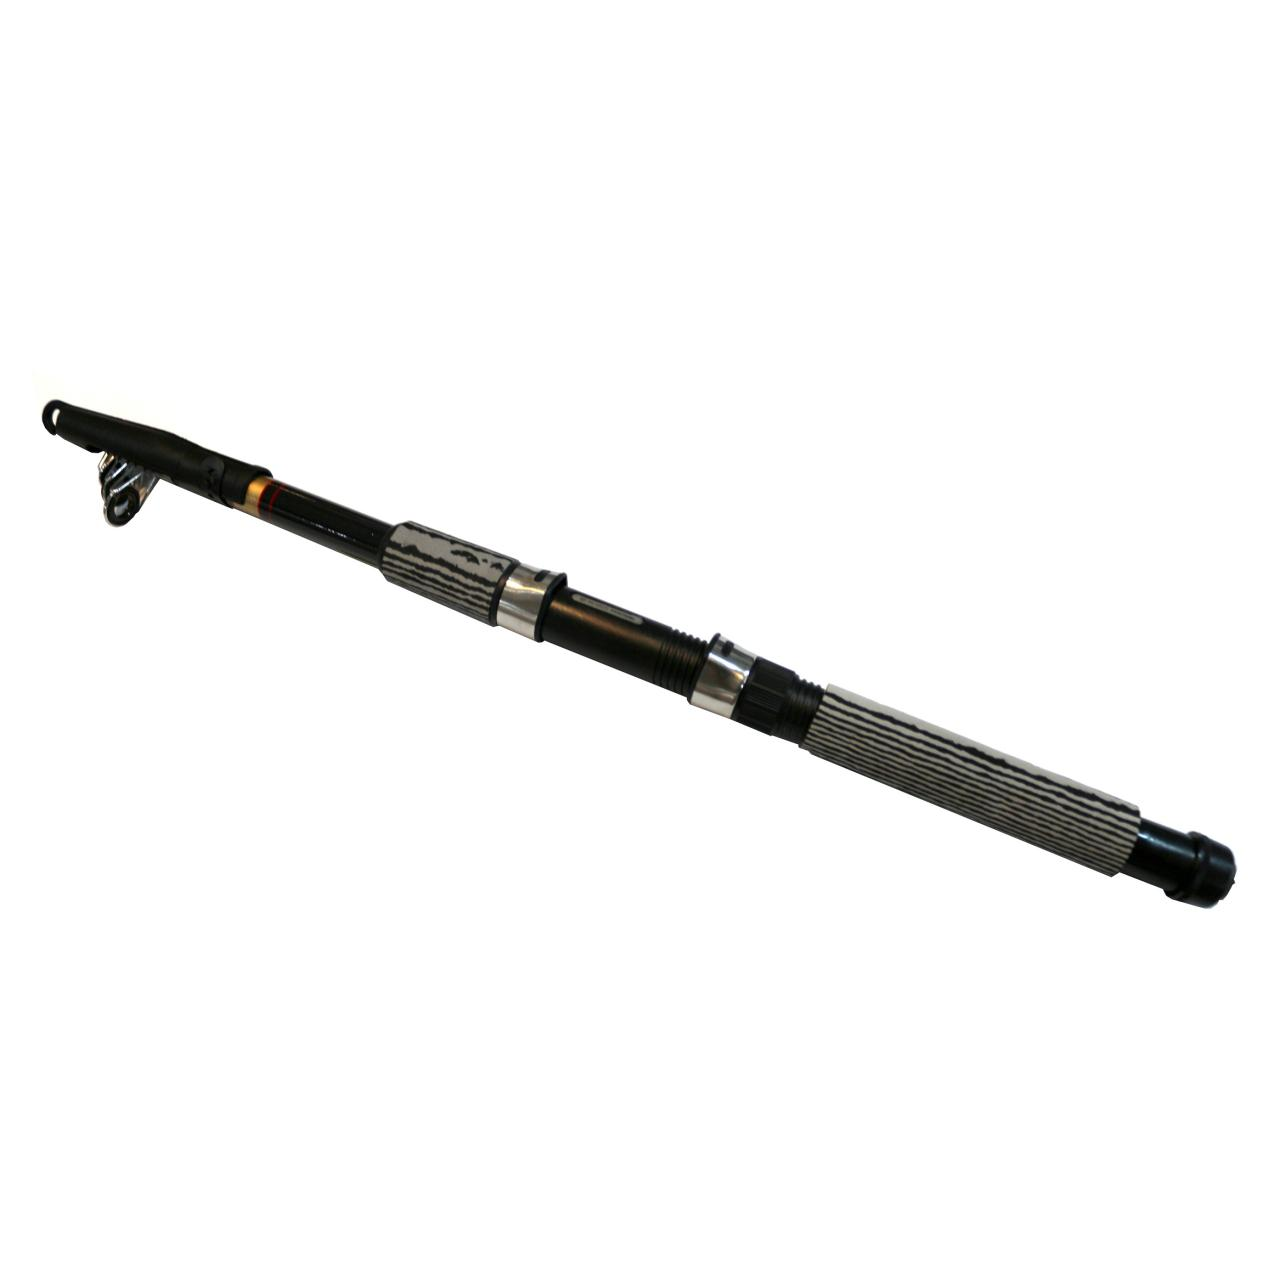 چوب ماهیگیری تله پارتنر مدل TP-360